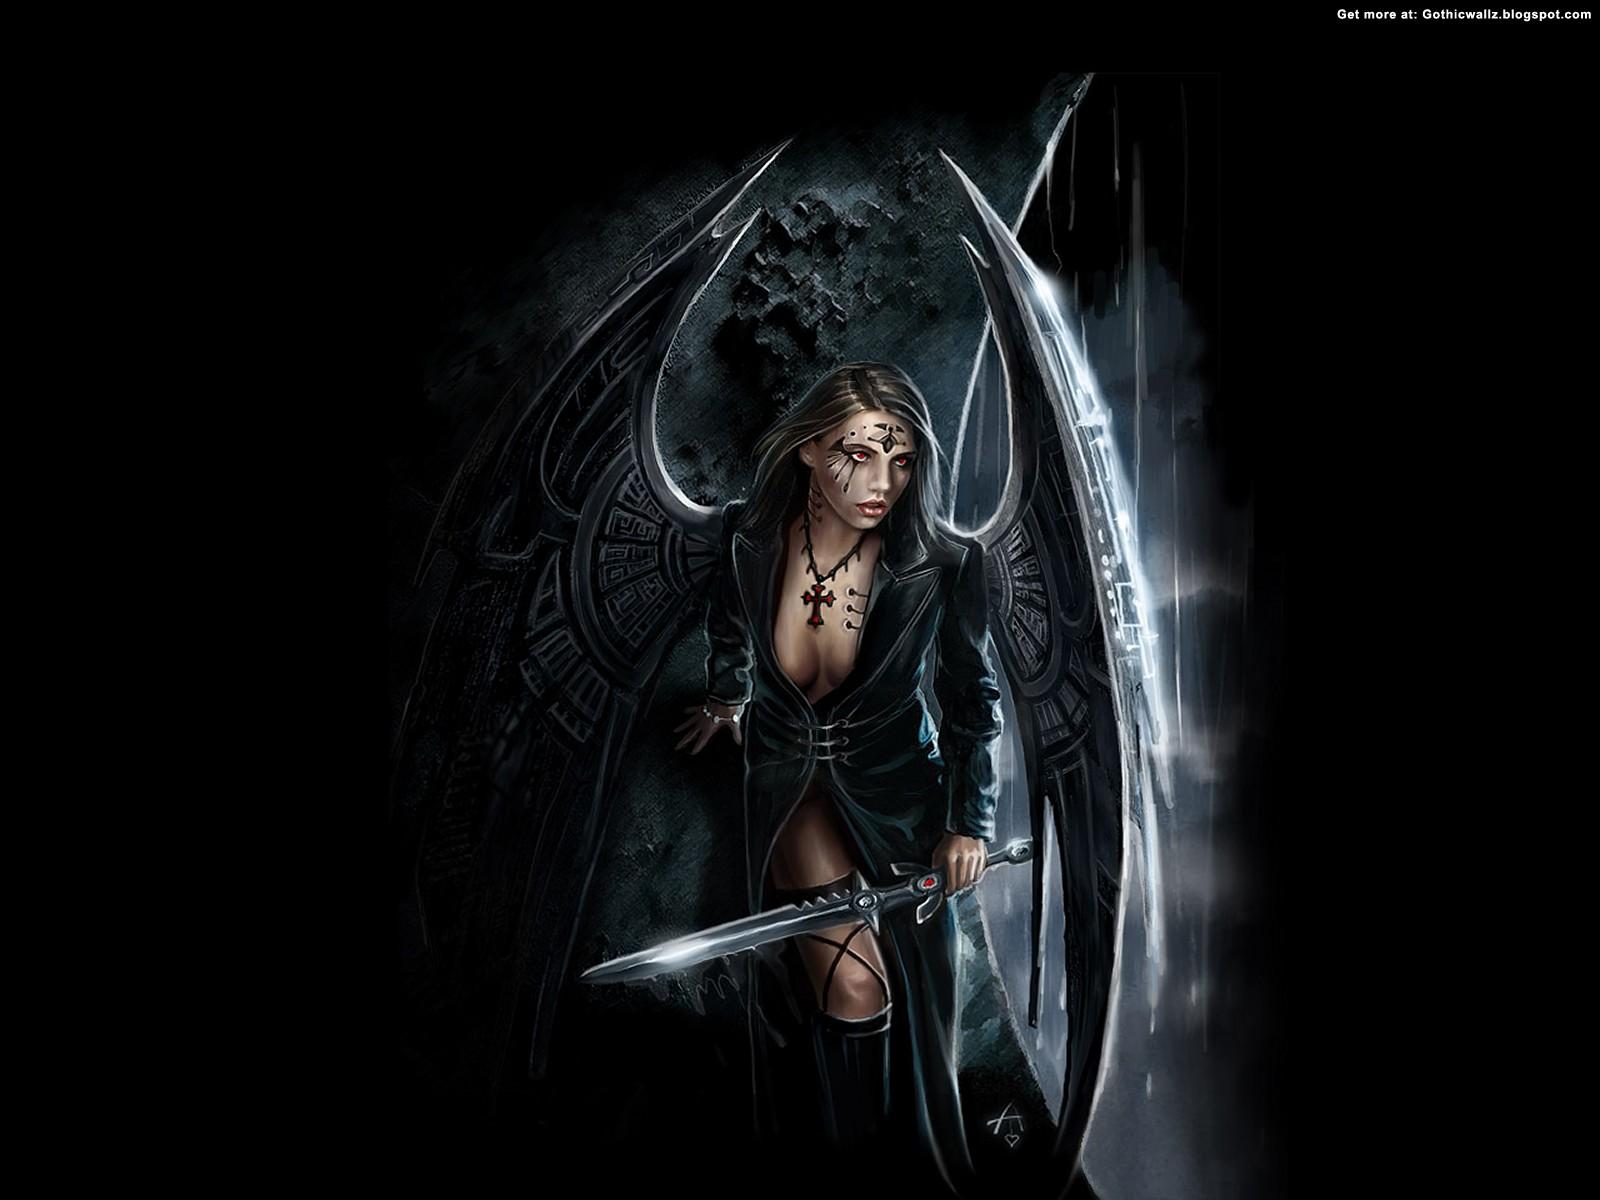 Gothic Angel Dark Gothic Wallpapers Free Gothic